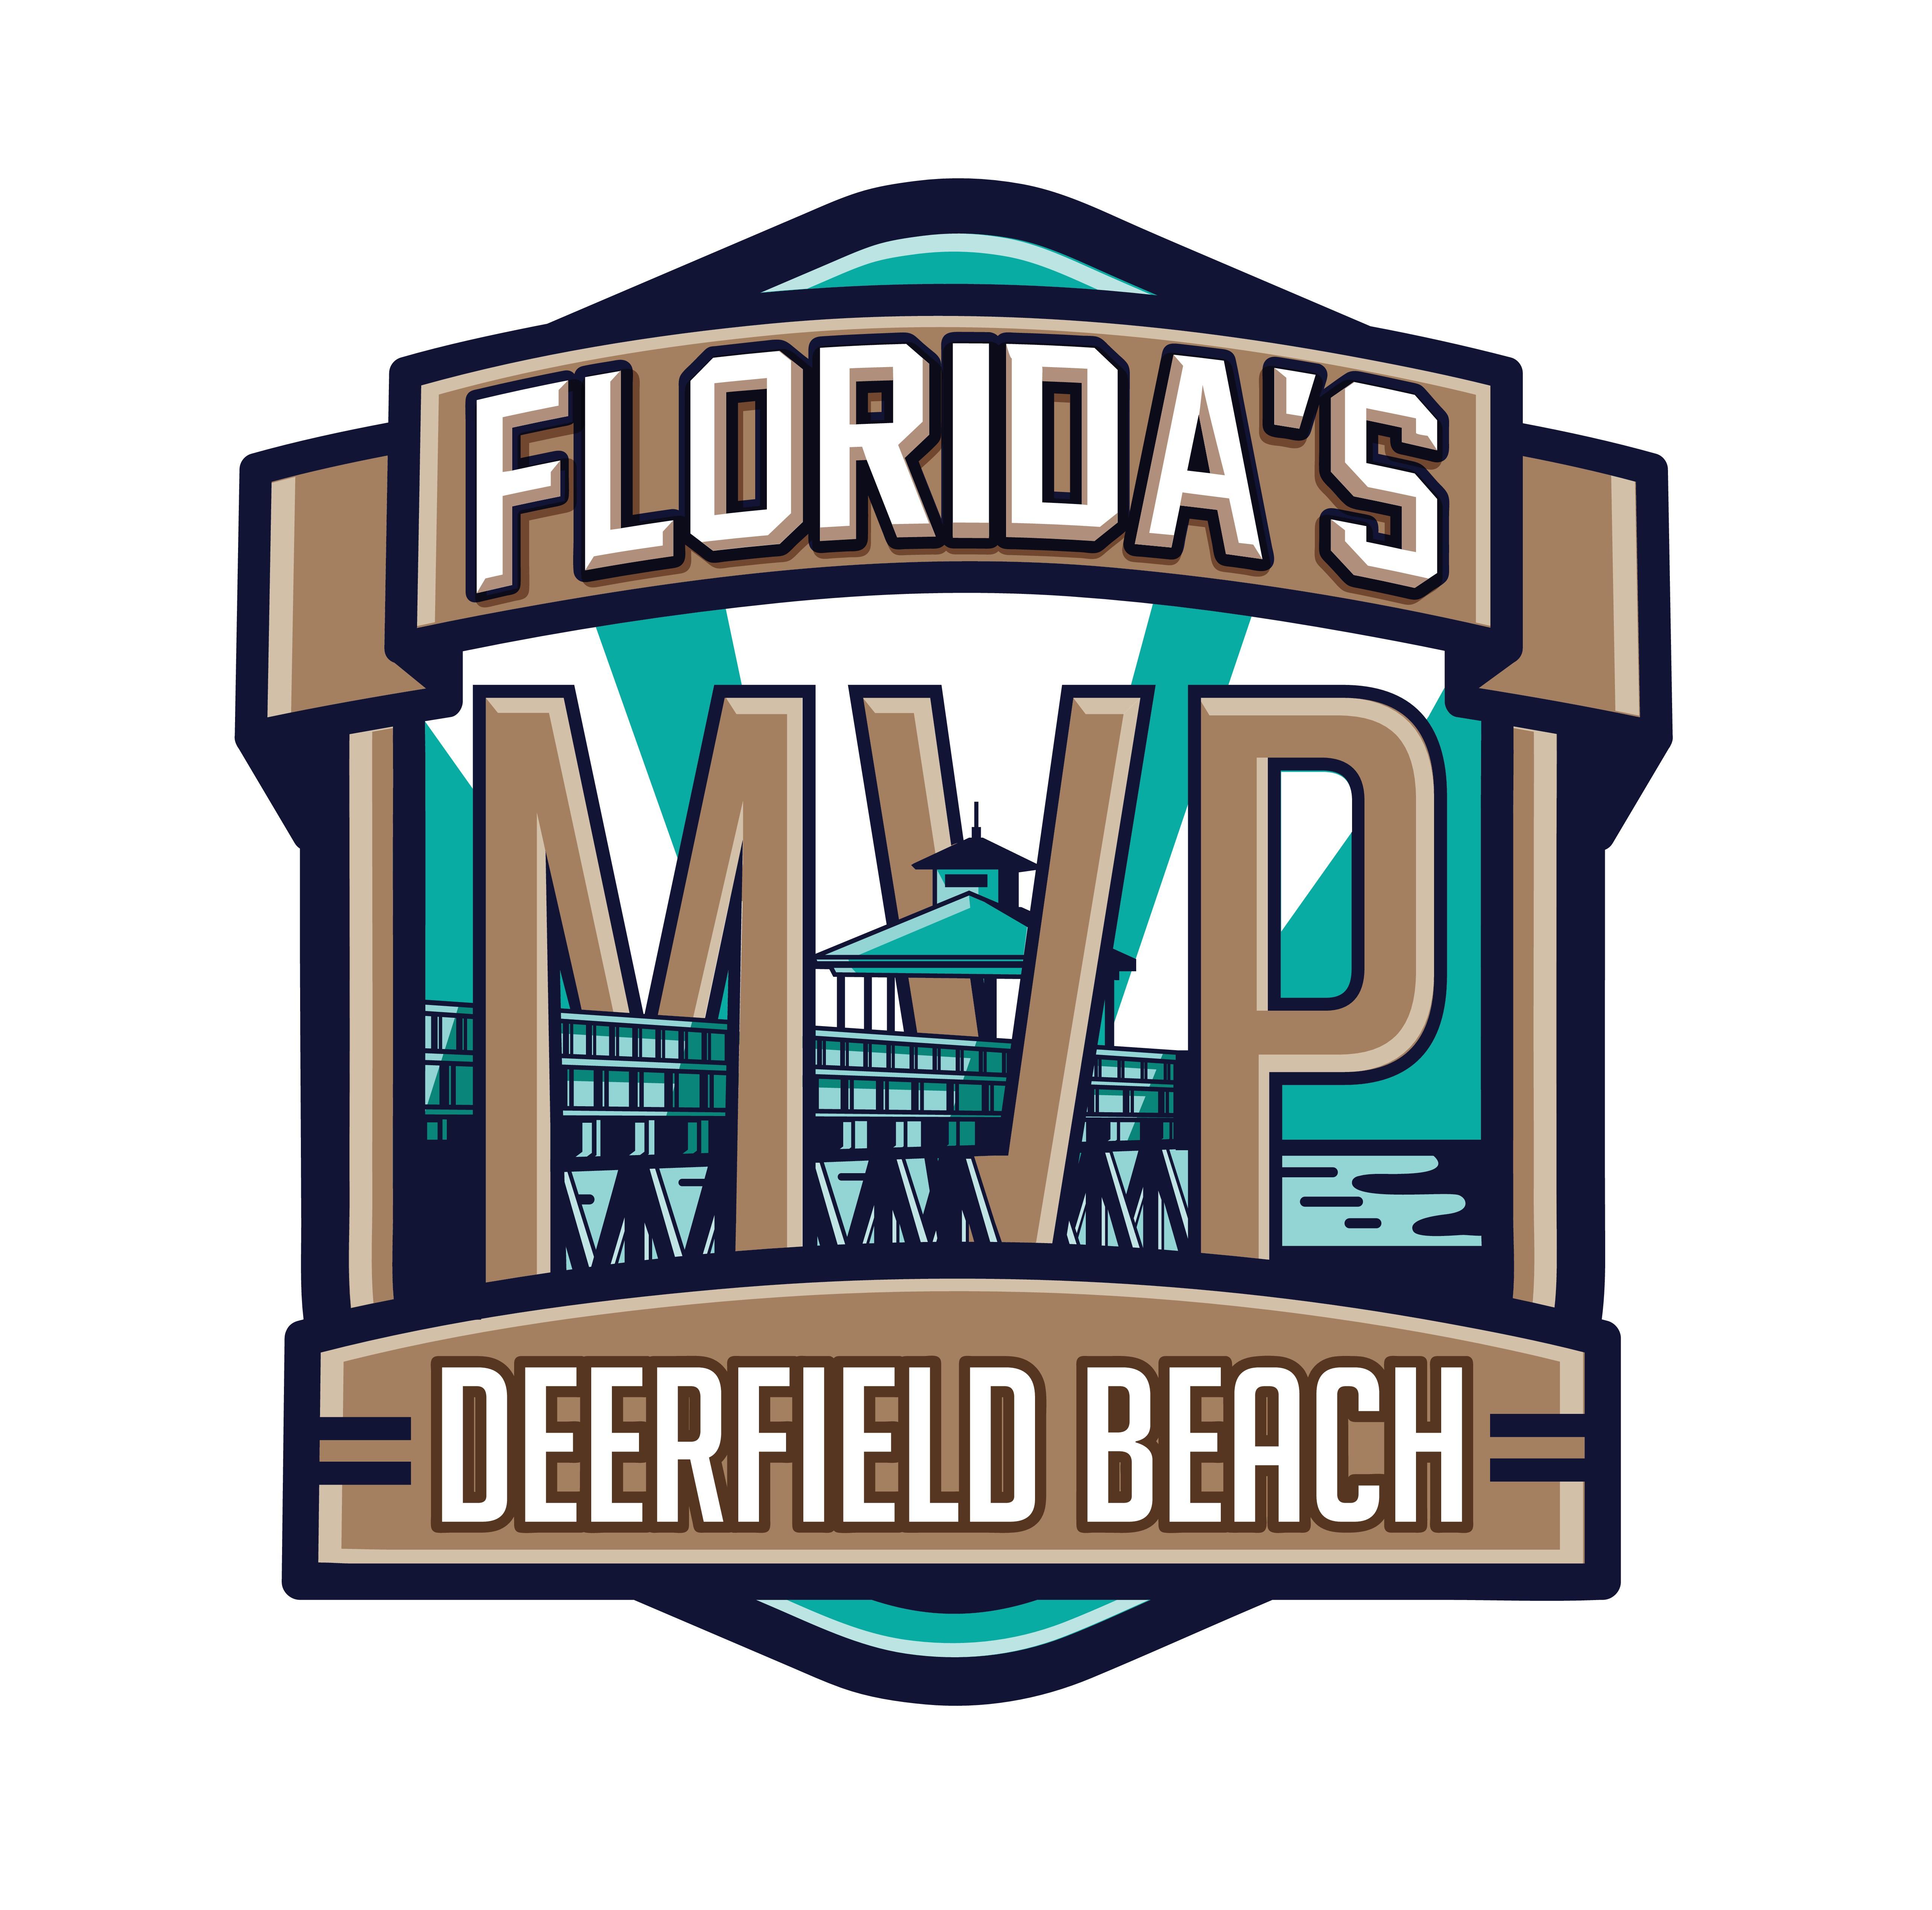 Florida's MVP!